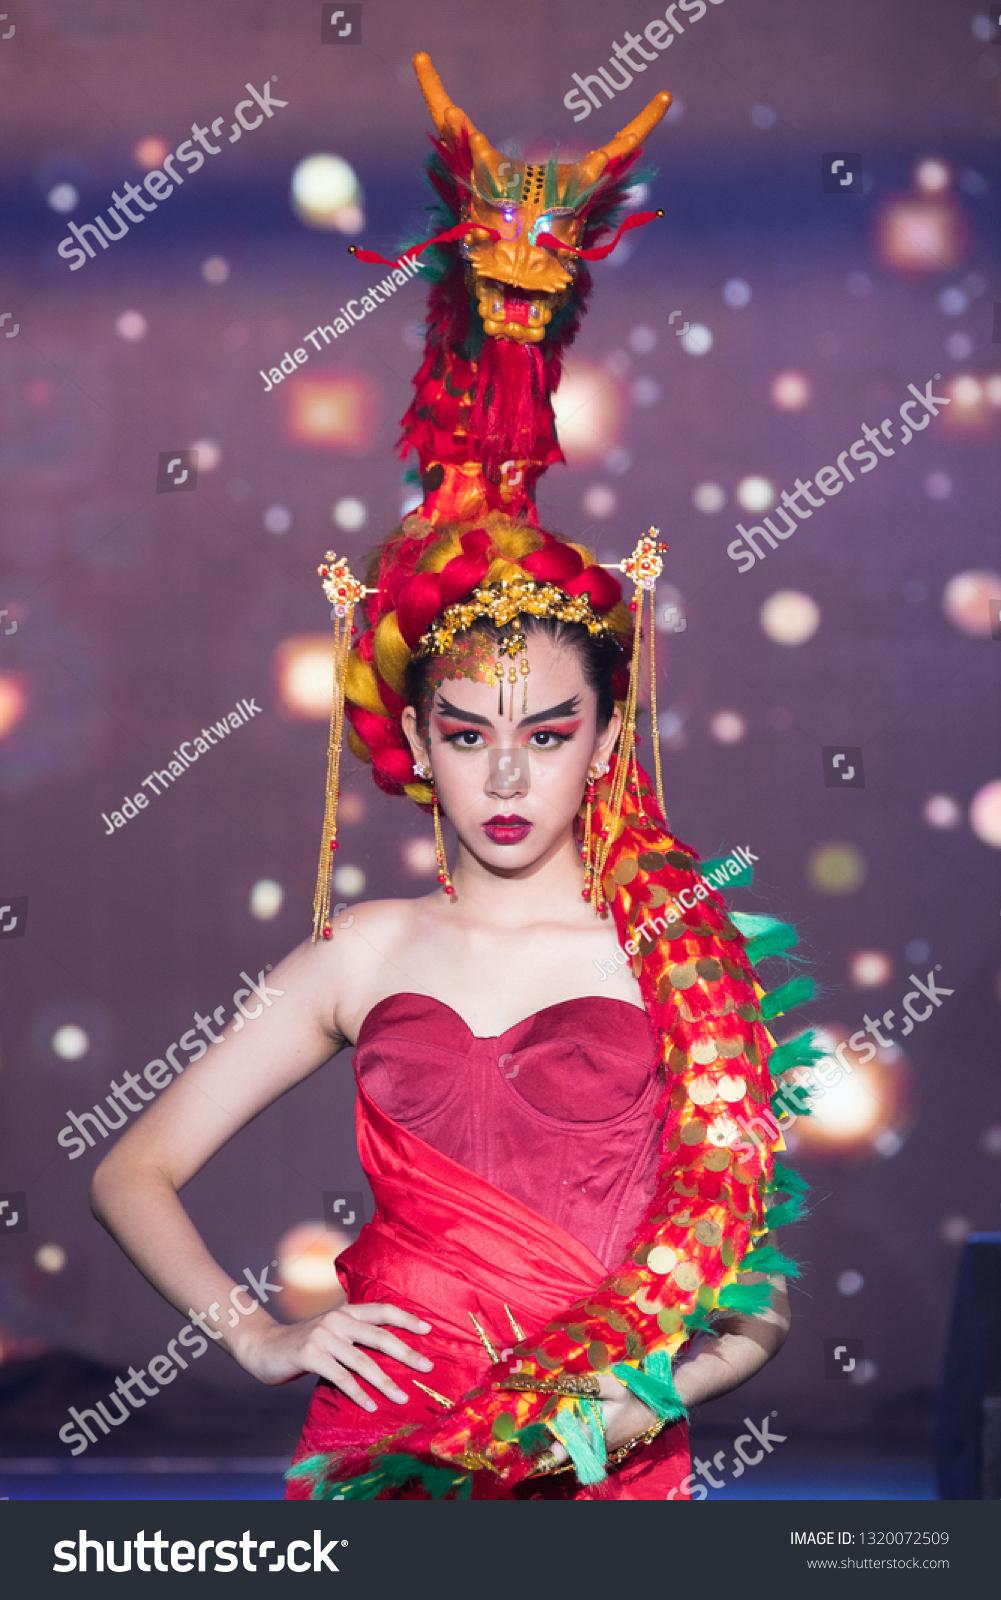 Bangkok Thailand February 20 2019 Professional Stock Photo Edit Now 1320072509